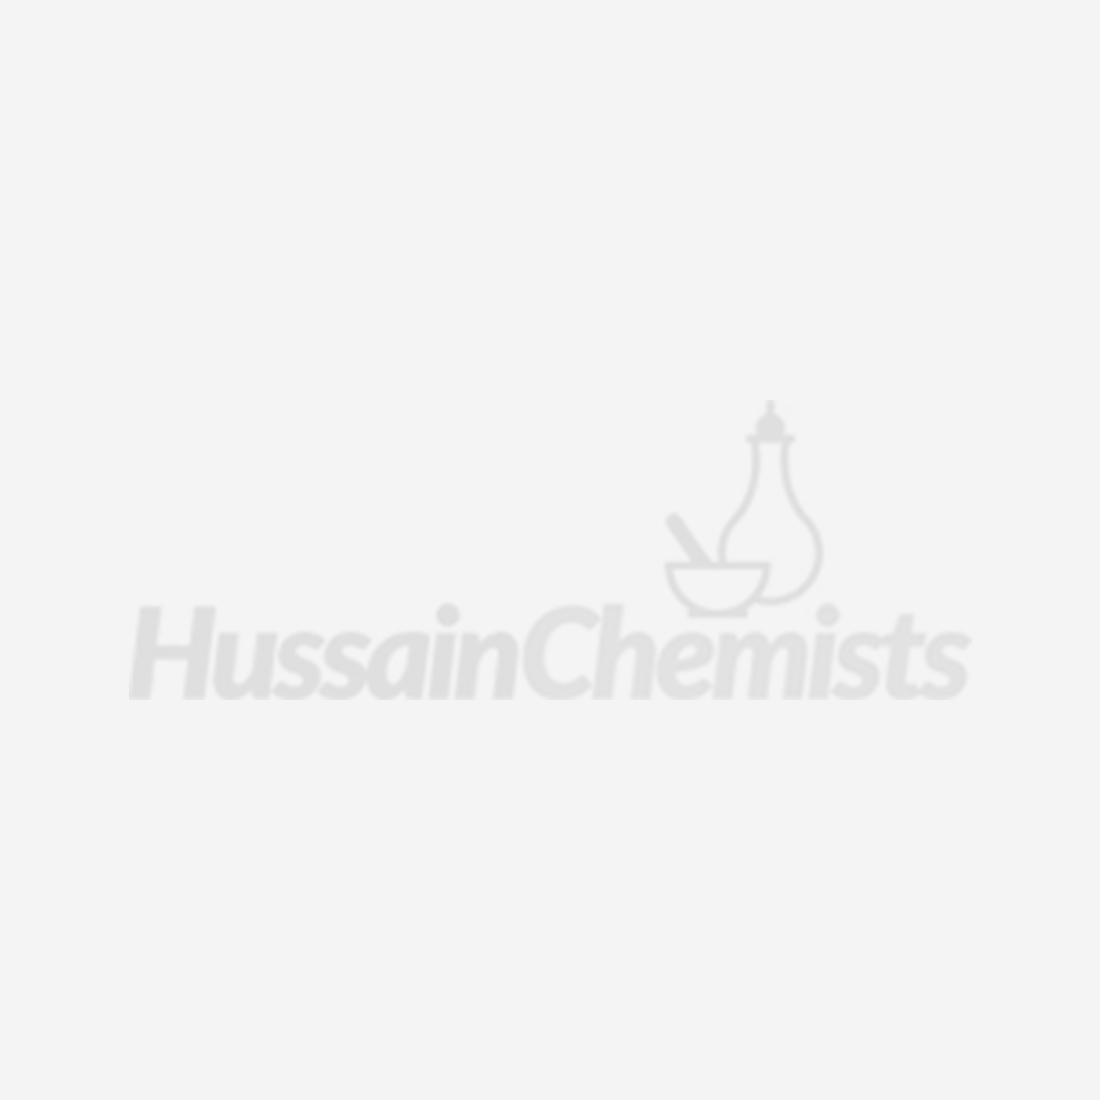 CALPOL Soothe & Care Saline Nasal Spray 15ml